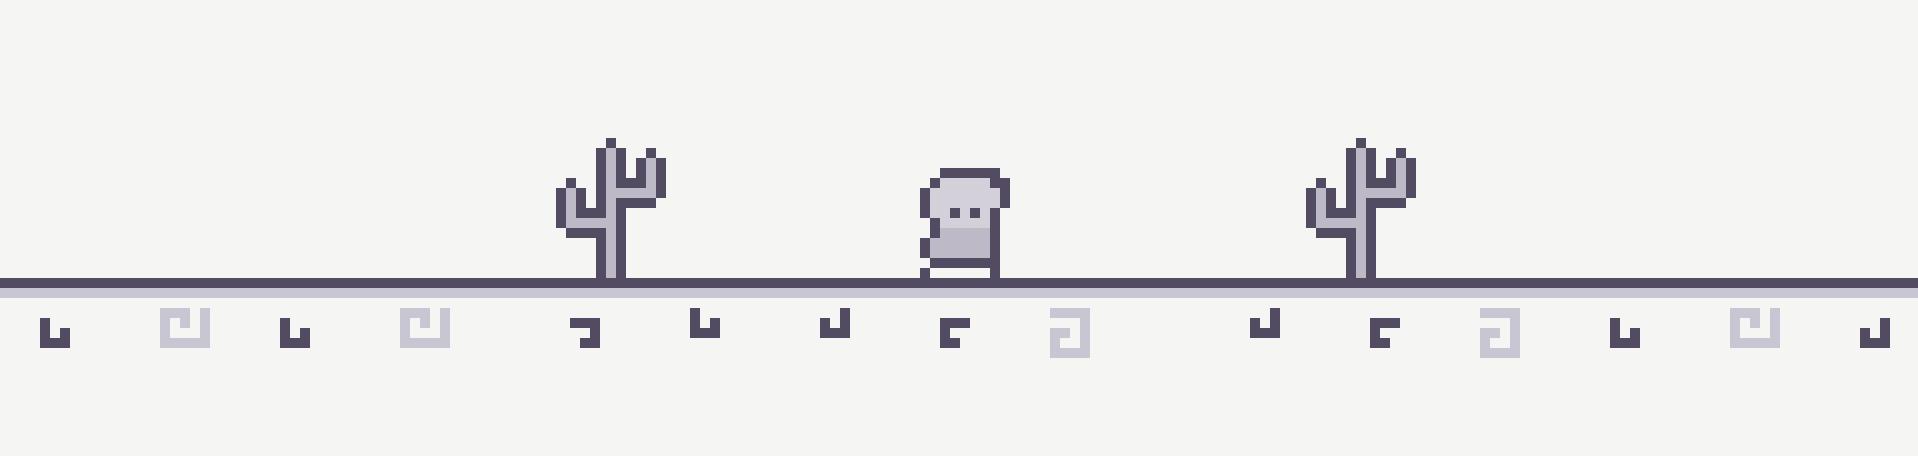 Run - A Story Of Pixel